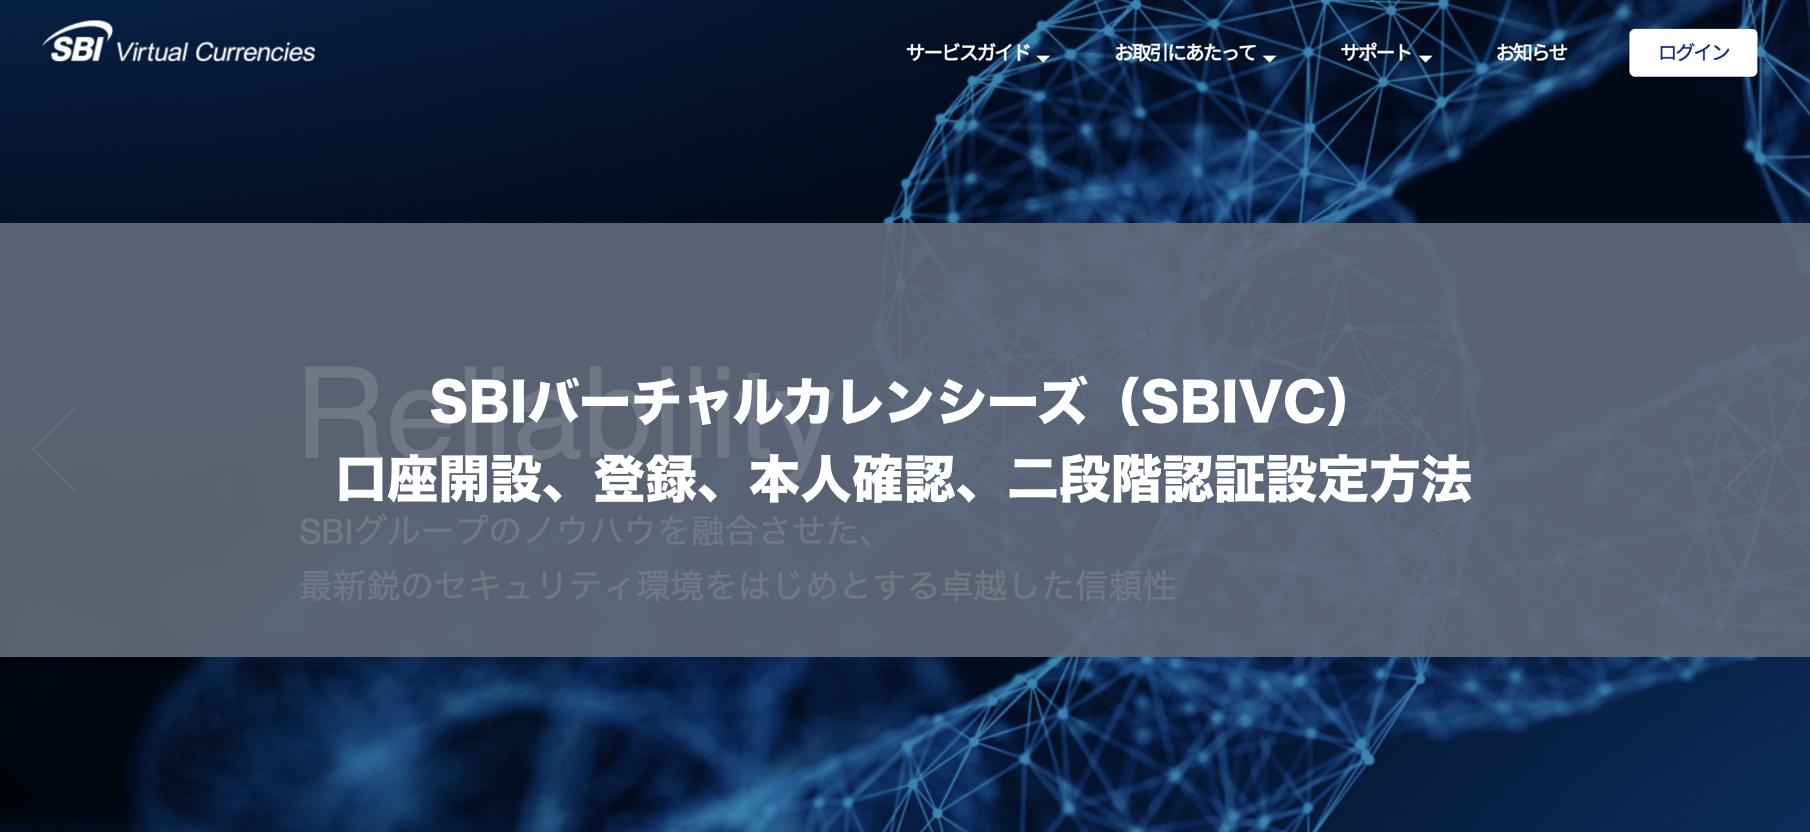 VCTRADE(SBIVC)の口座開設、登録、本人確認方法を分かりやすく解説!